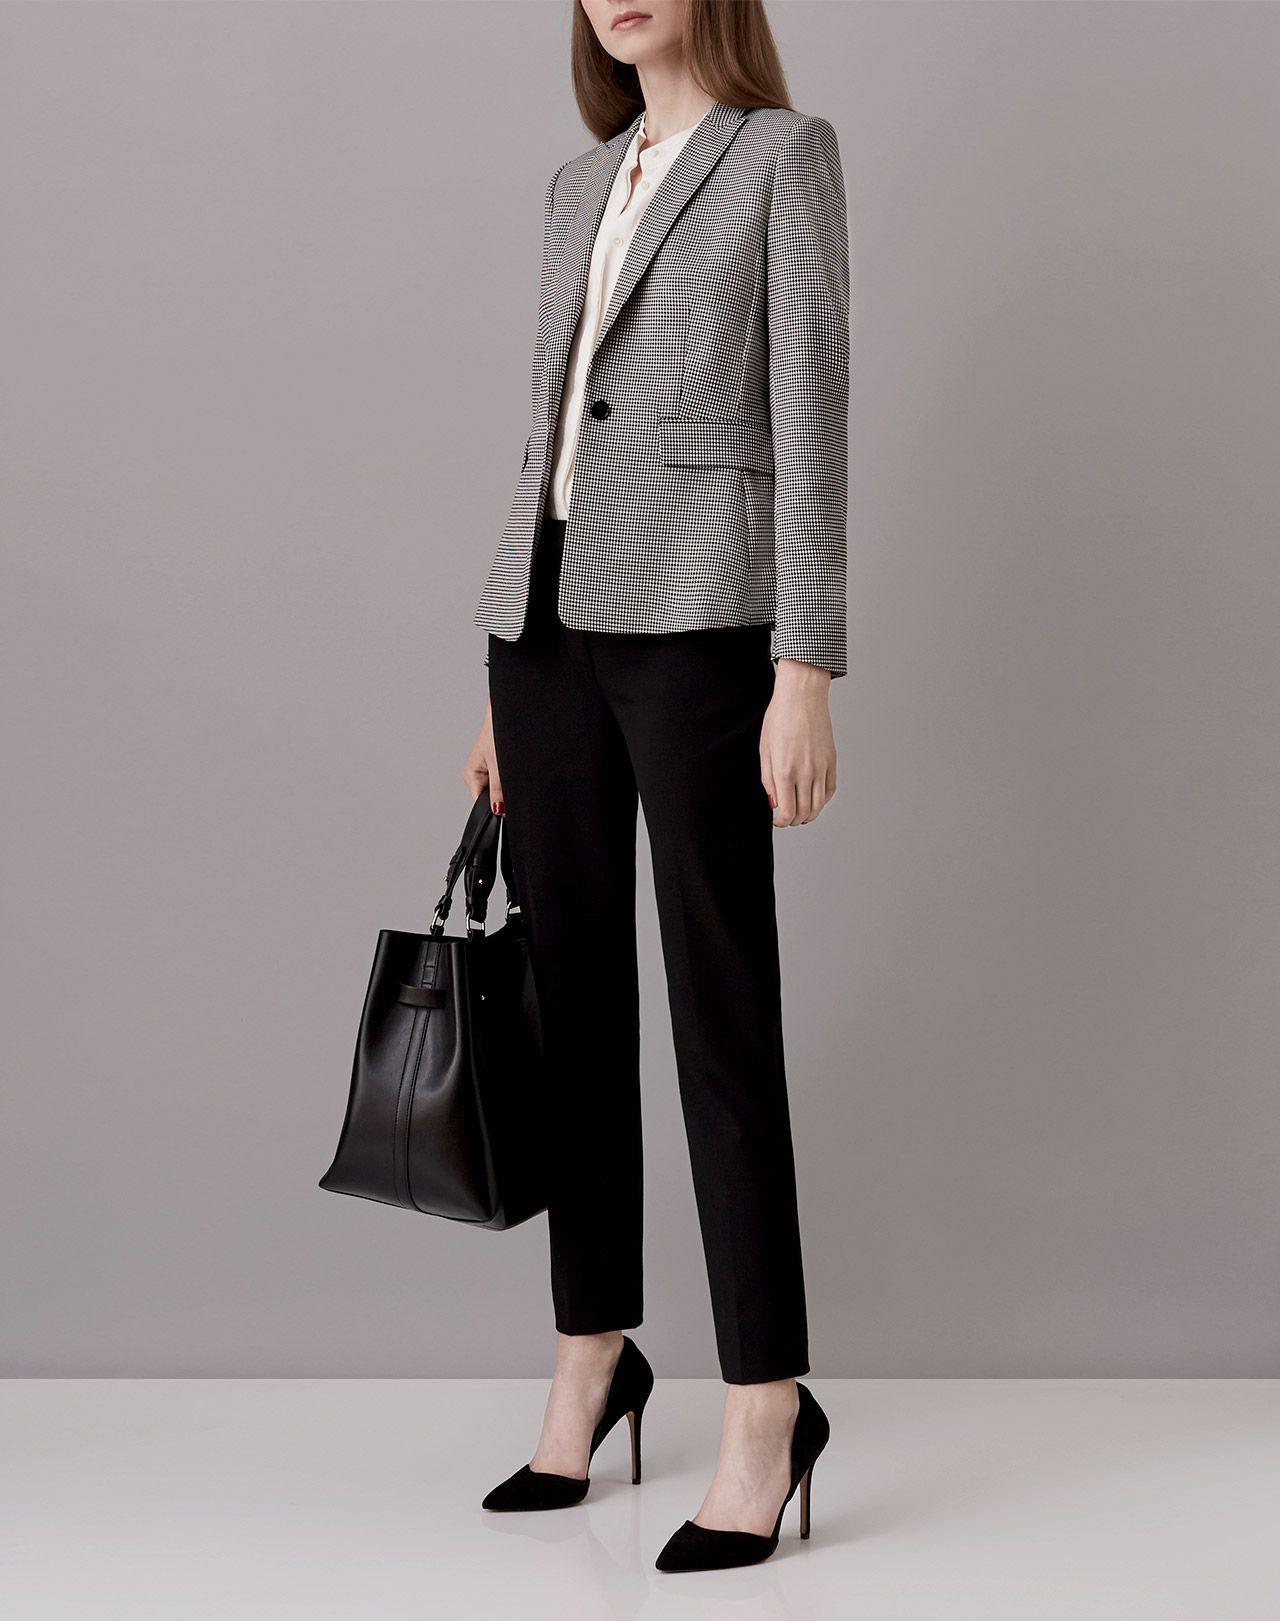 9d49026829f Women s Workwear - REISS Editorial